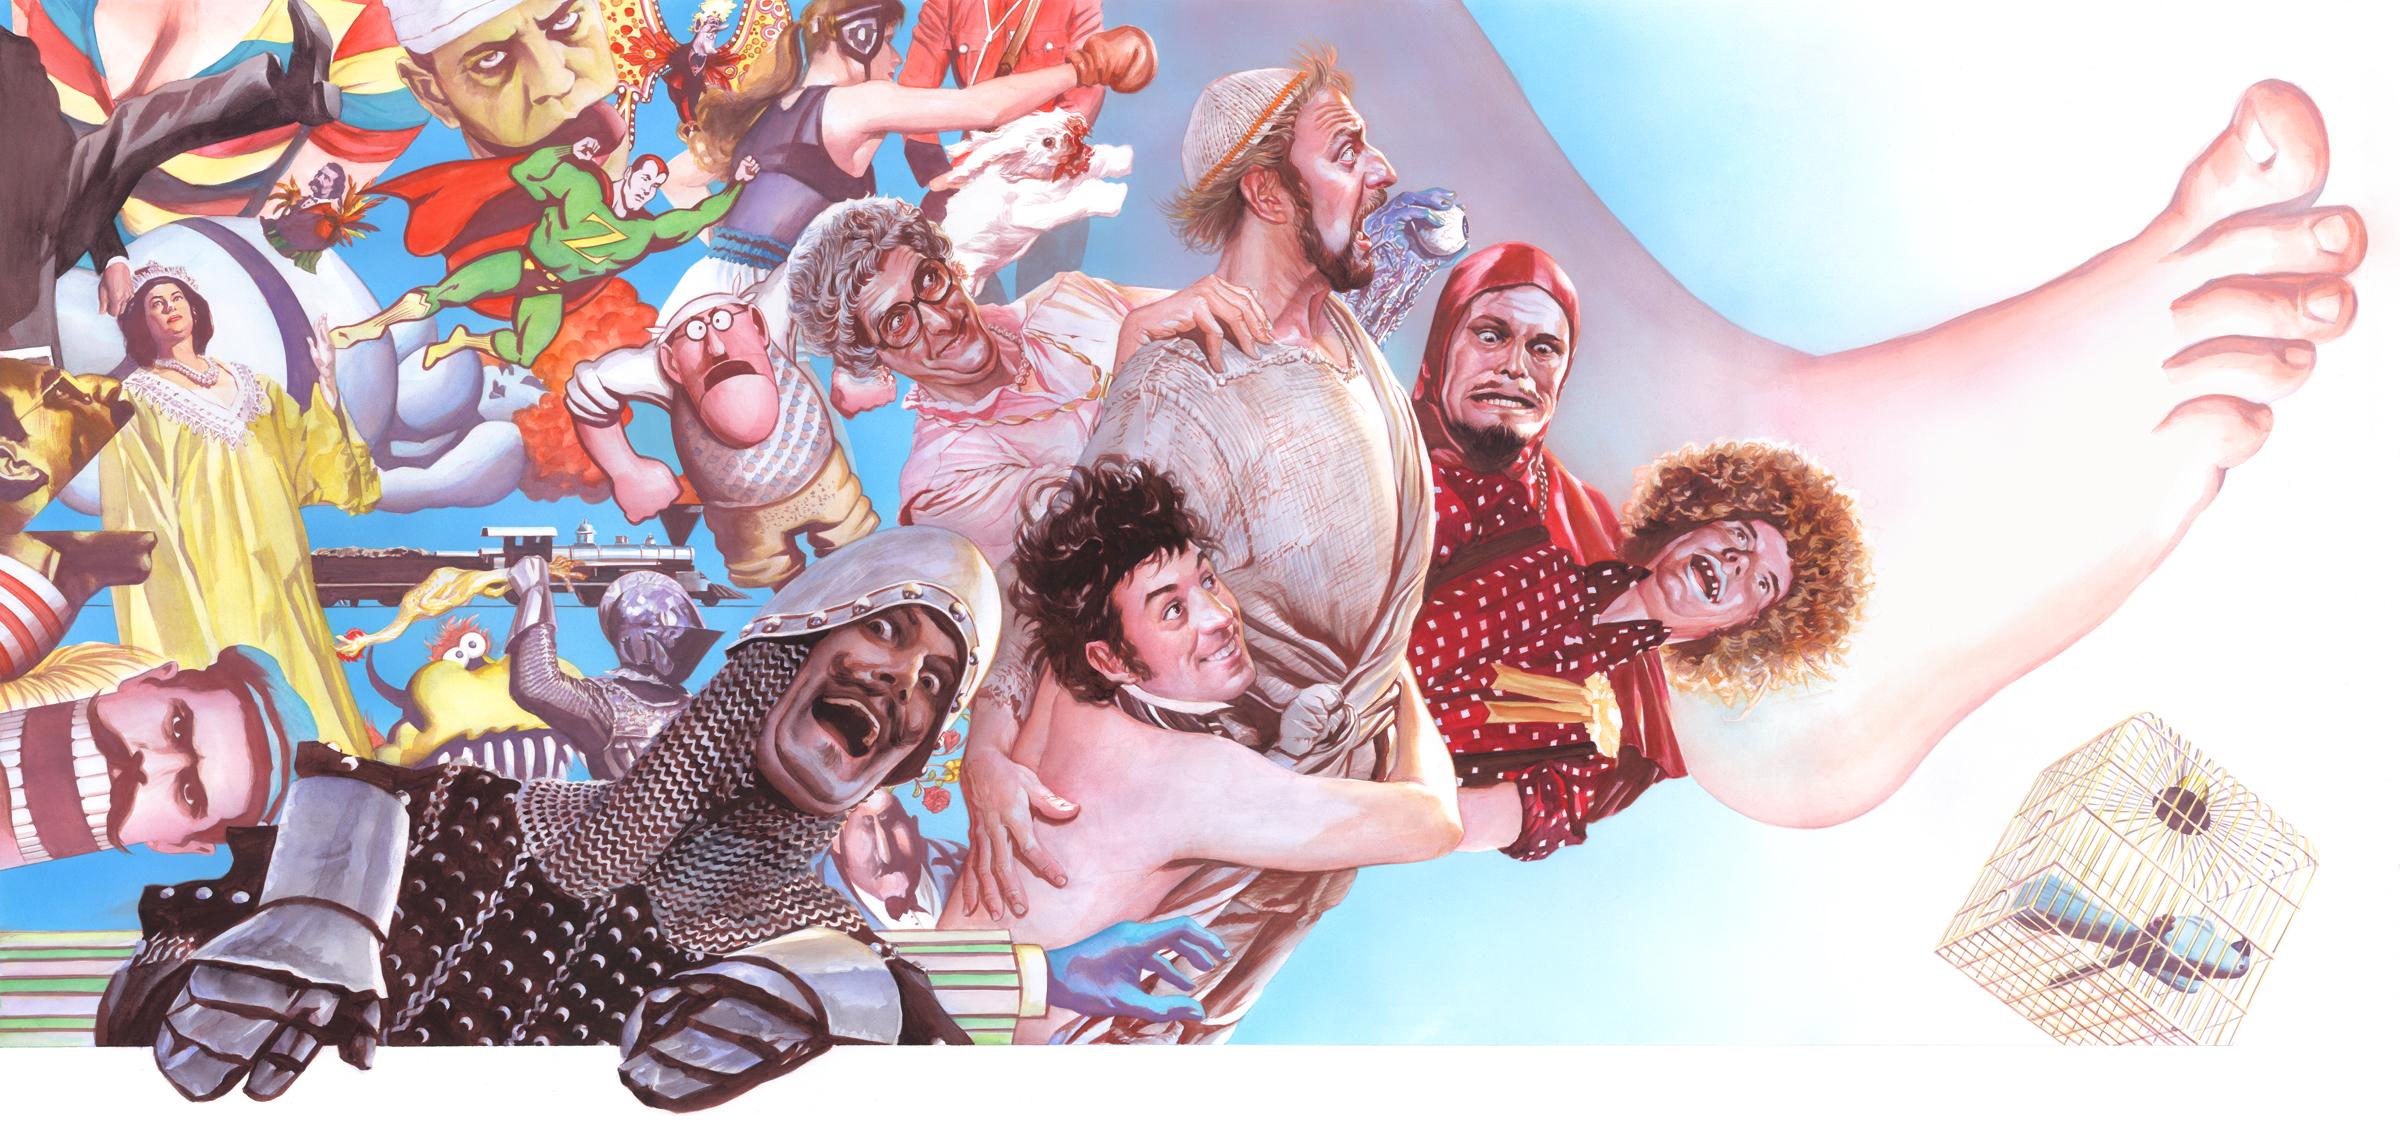 Monty Python Alex Ross